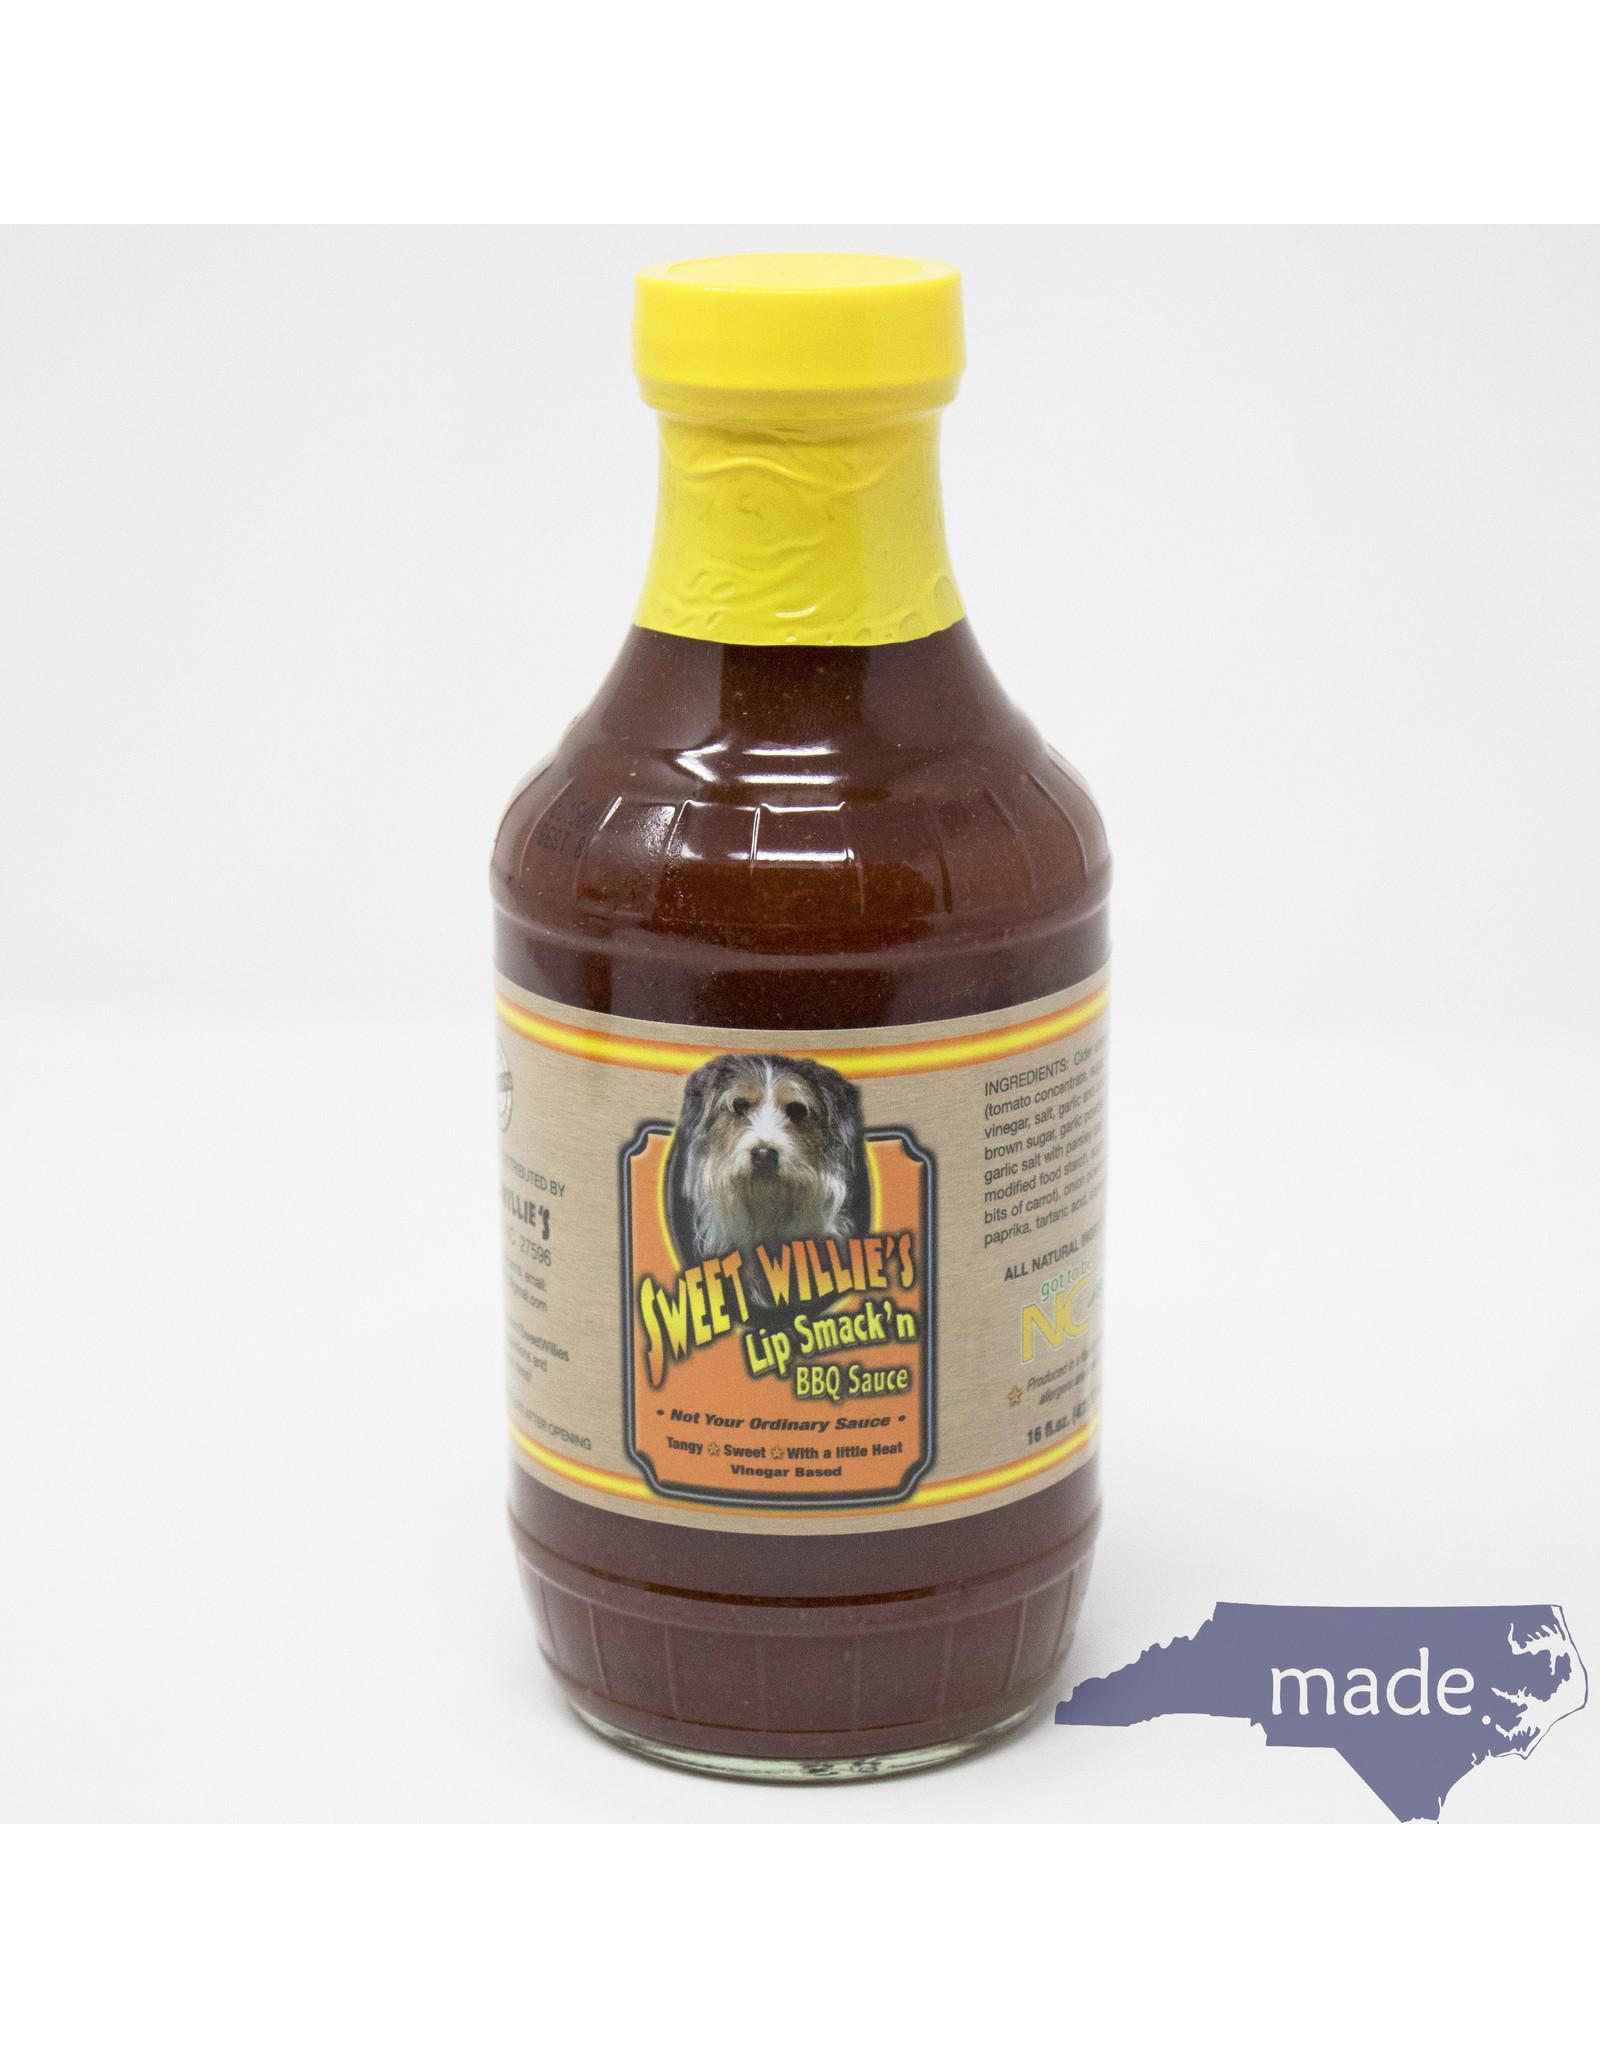 Sweet Willie's Lip Smack'n Sauce - Sweet Willie's